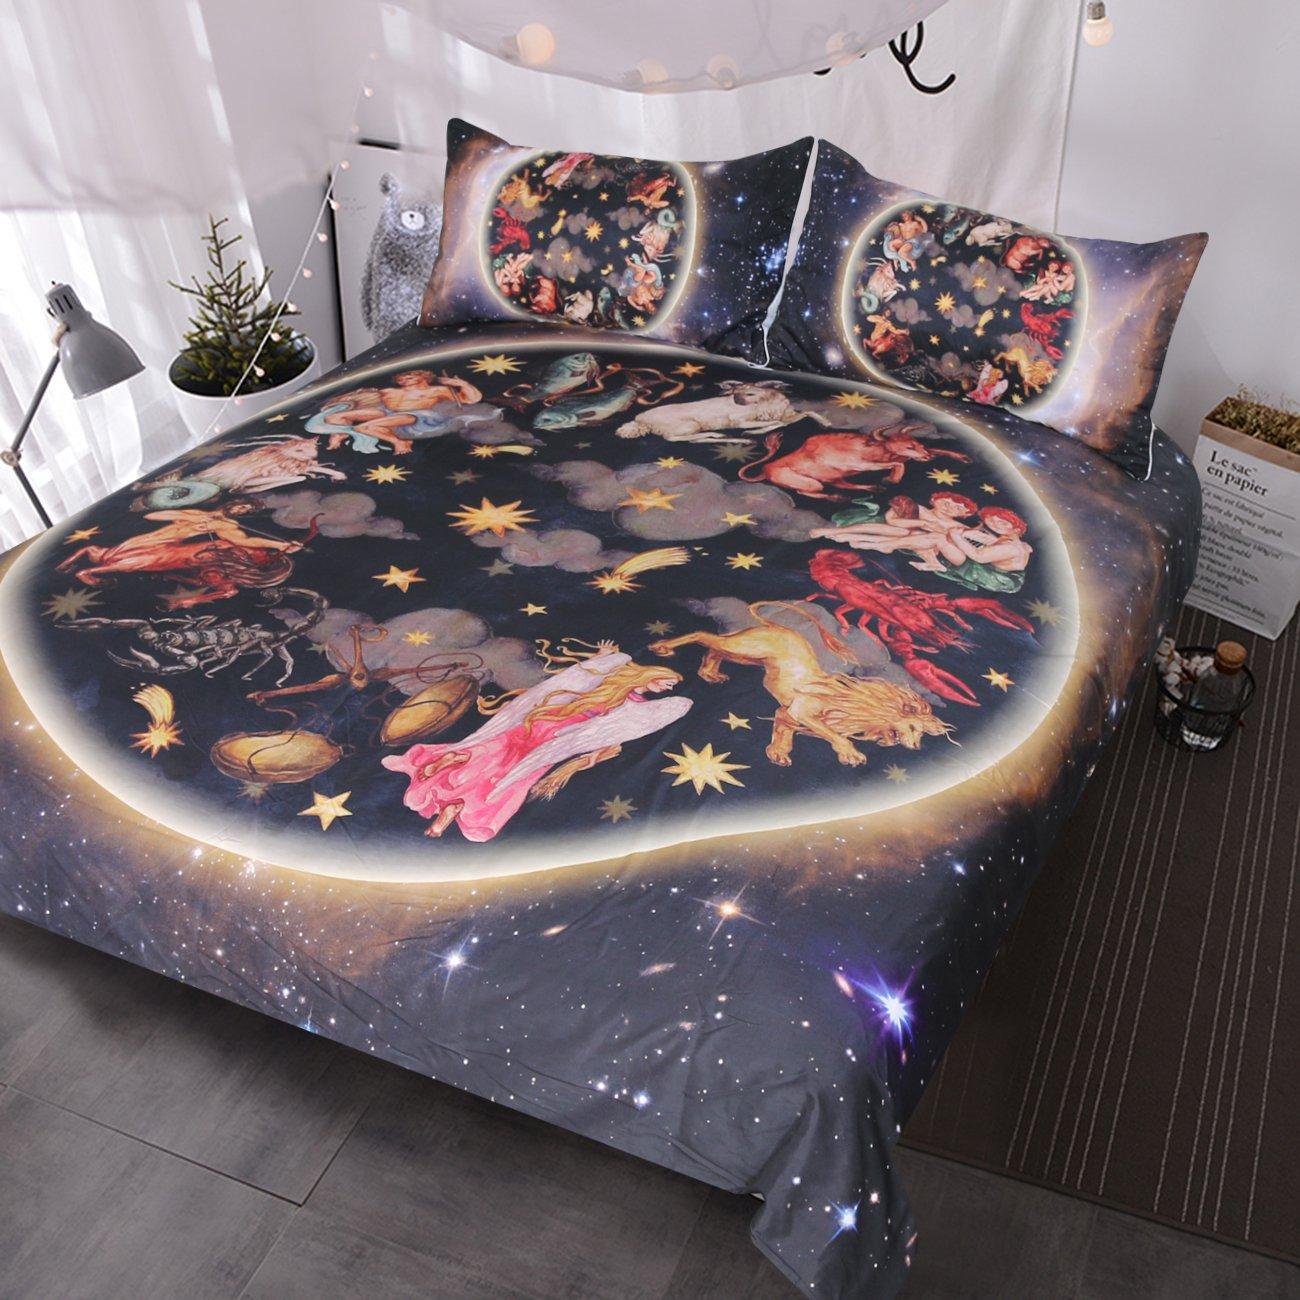 BlessLiving Galaxy Bedding 3 Pieces Animals Antique Asian Celestial Art Duvet Cover Set 3d Oriental Bedding Sets (Full)